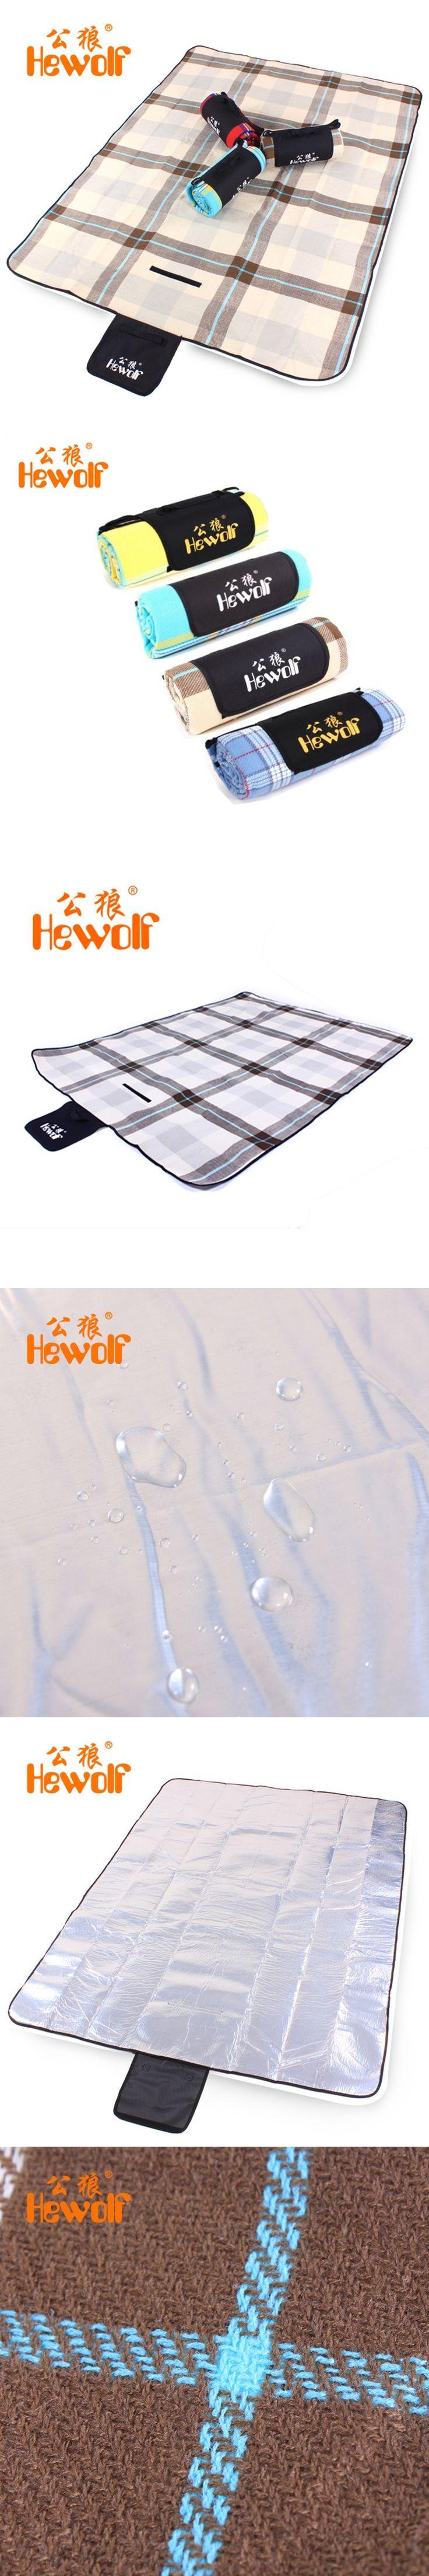 Hewolf Cashmere Picnic Mat waterproof Aluminum Film Tent Sleeping Pad Foldable Beach Camping mat blanket Cushion 170*130cm